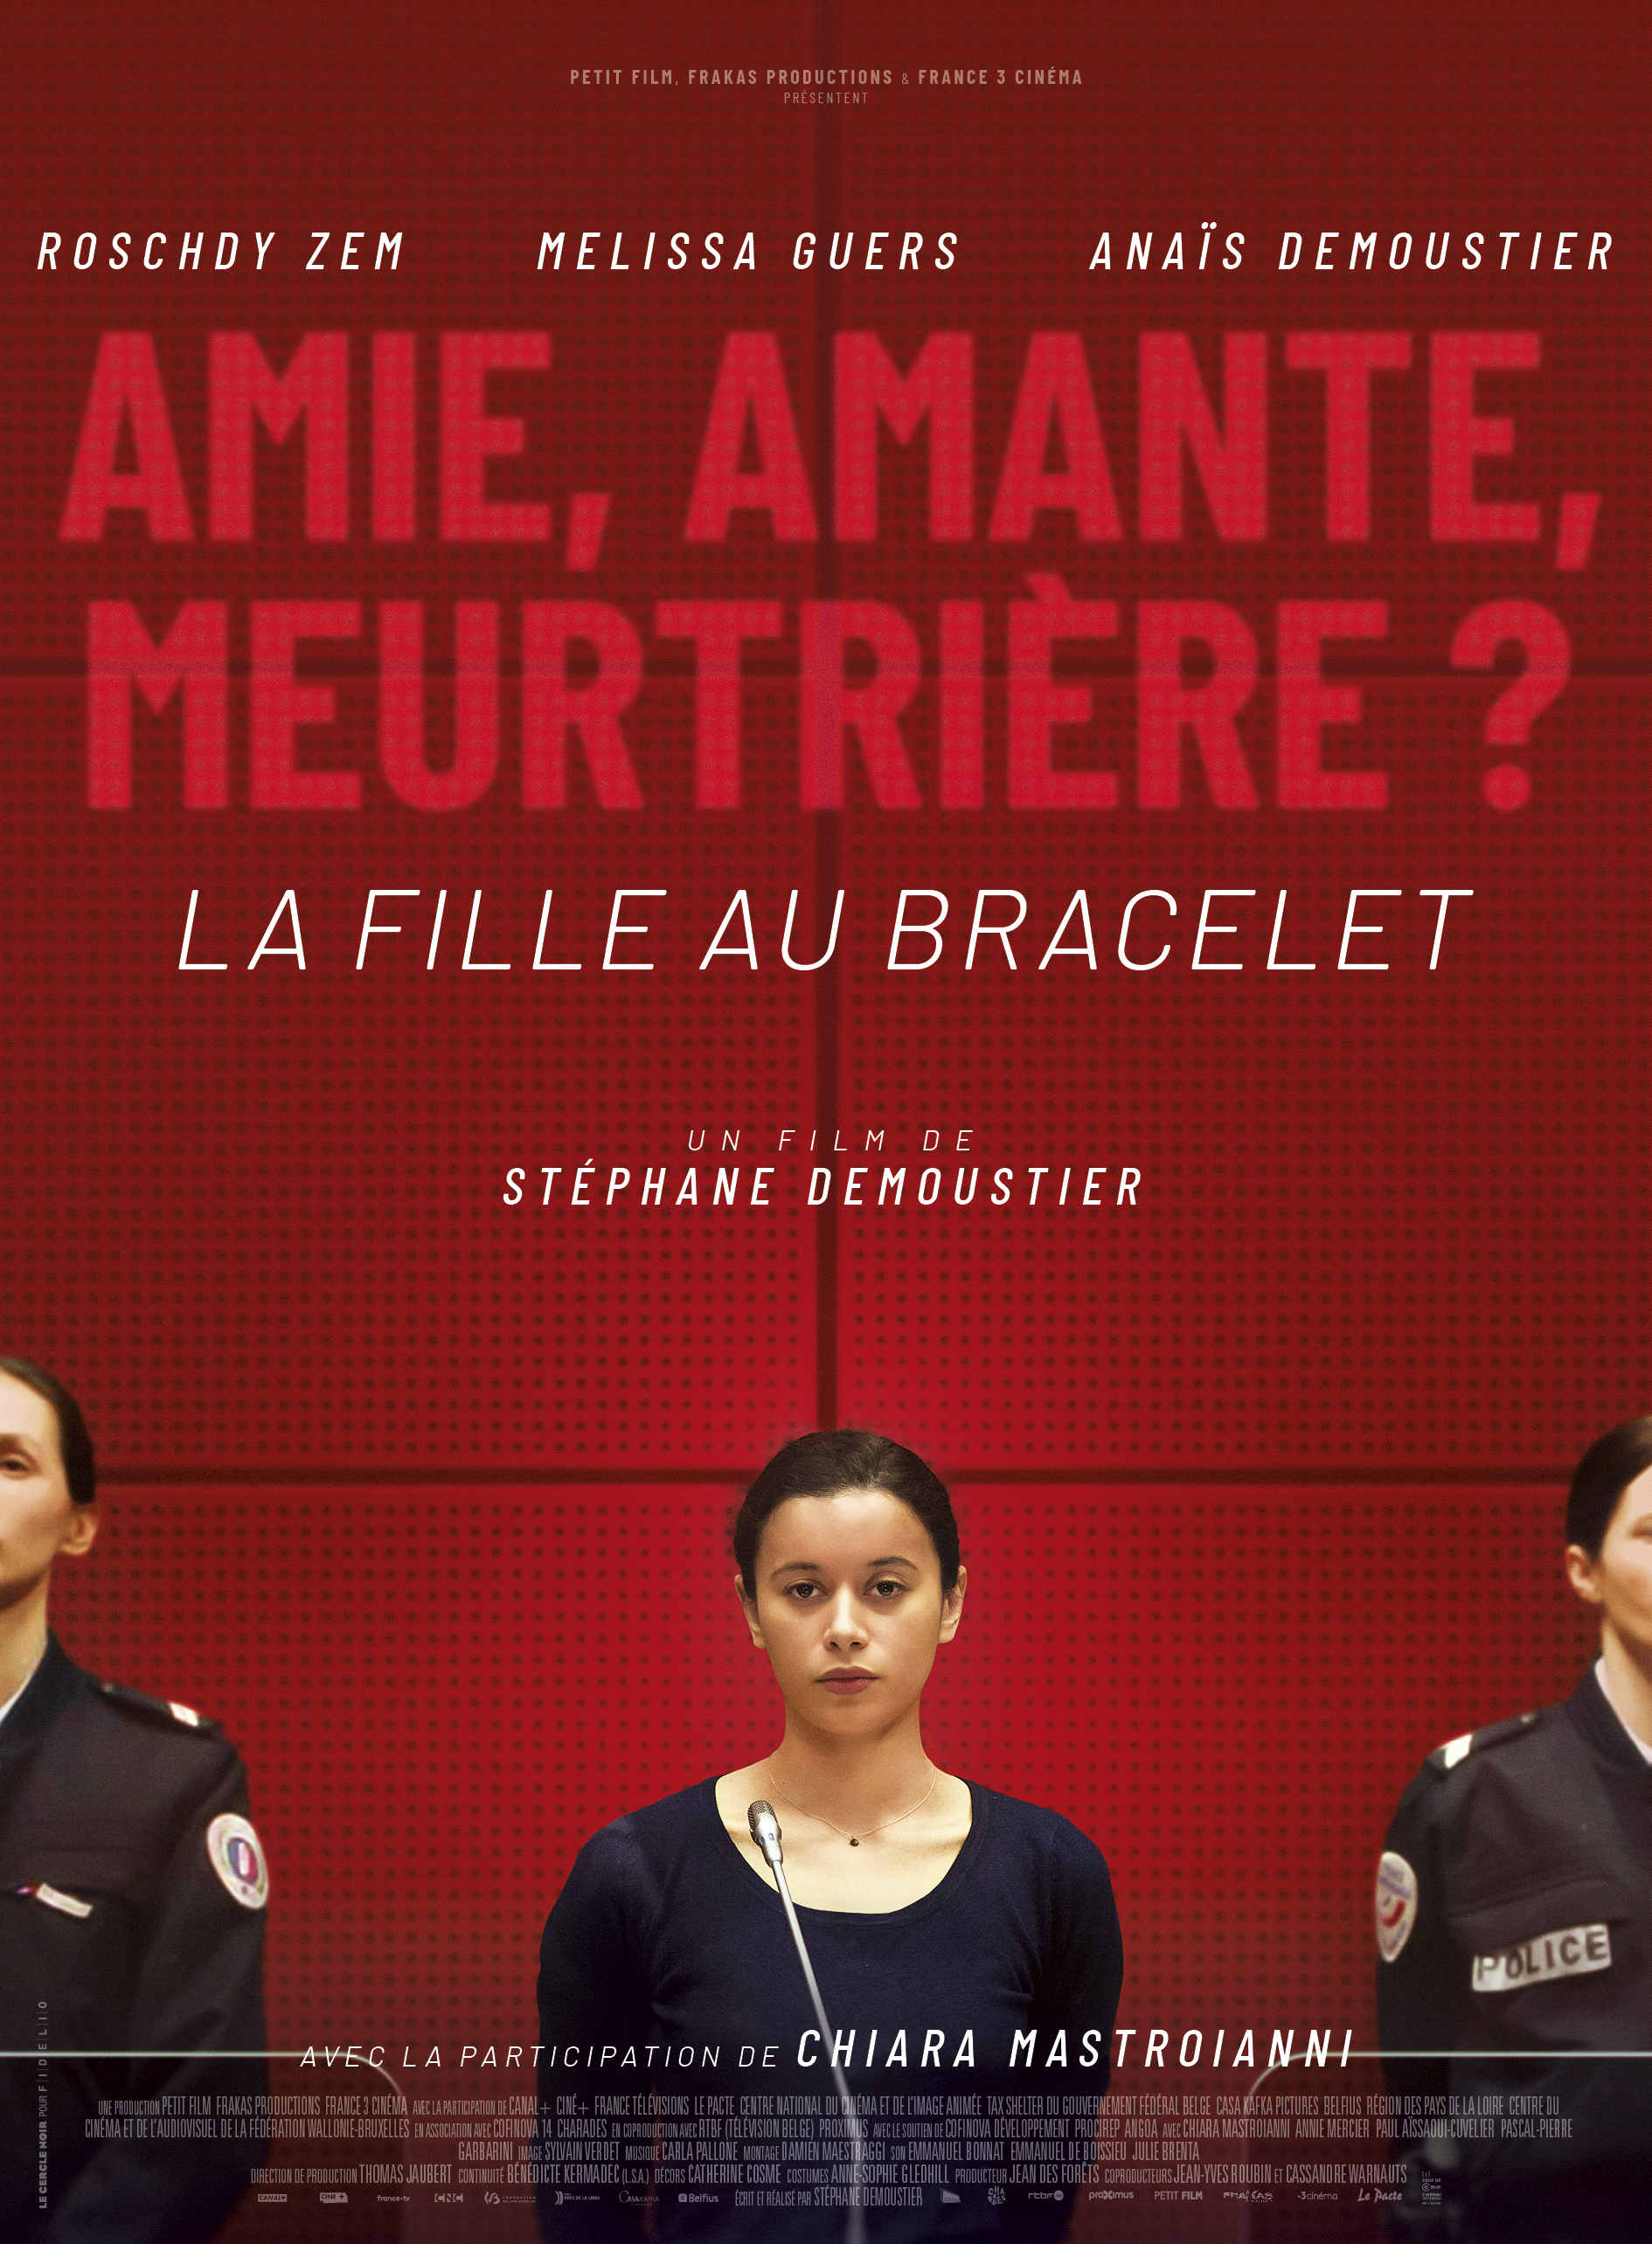 La fille au bracelet (The Girl with a Bracelet)